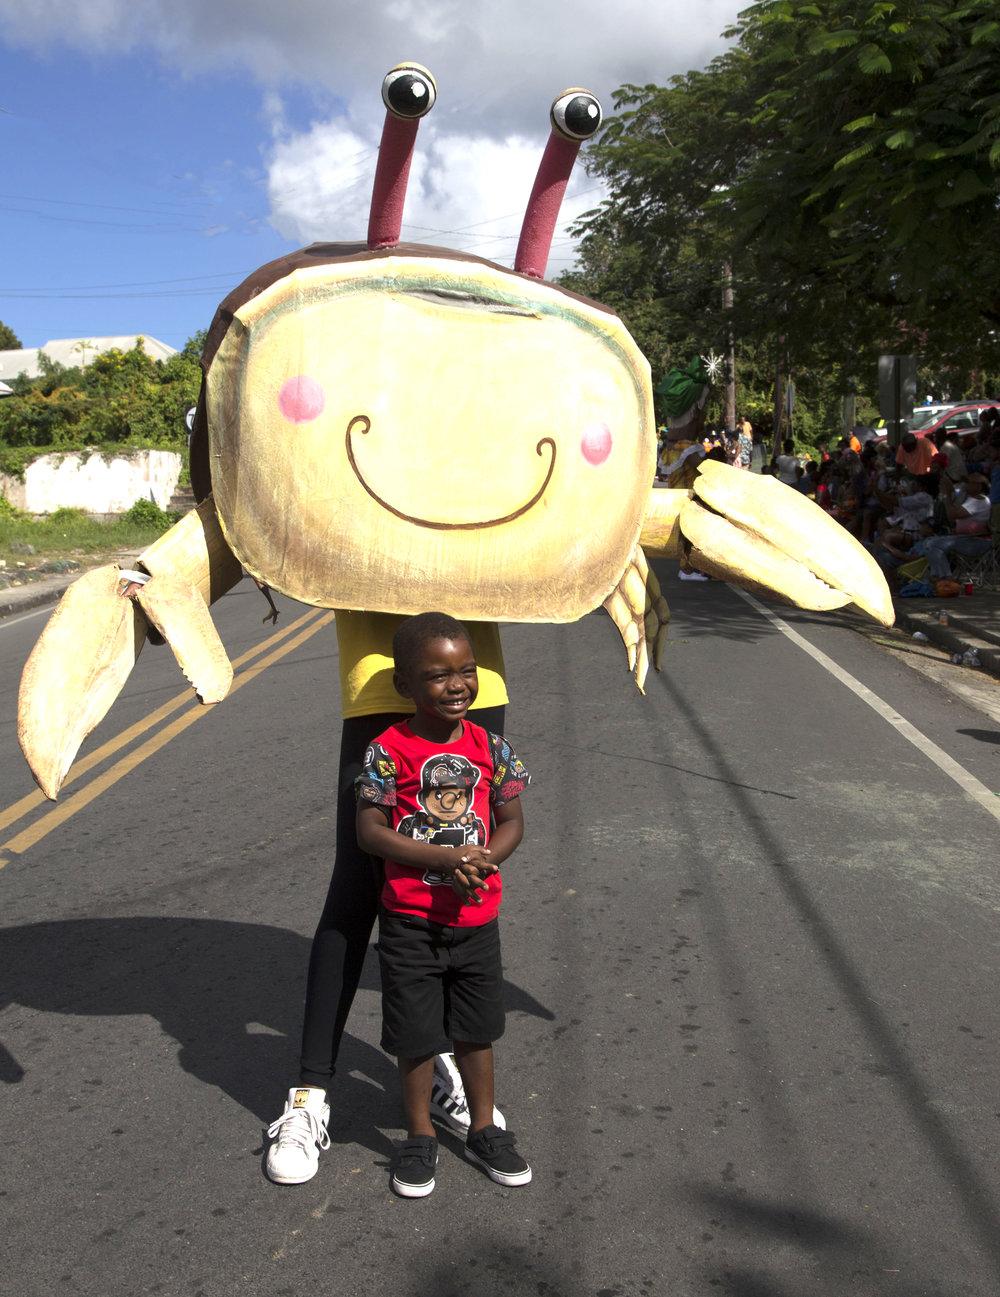 Crab-puppet-wkid-a-.jpg